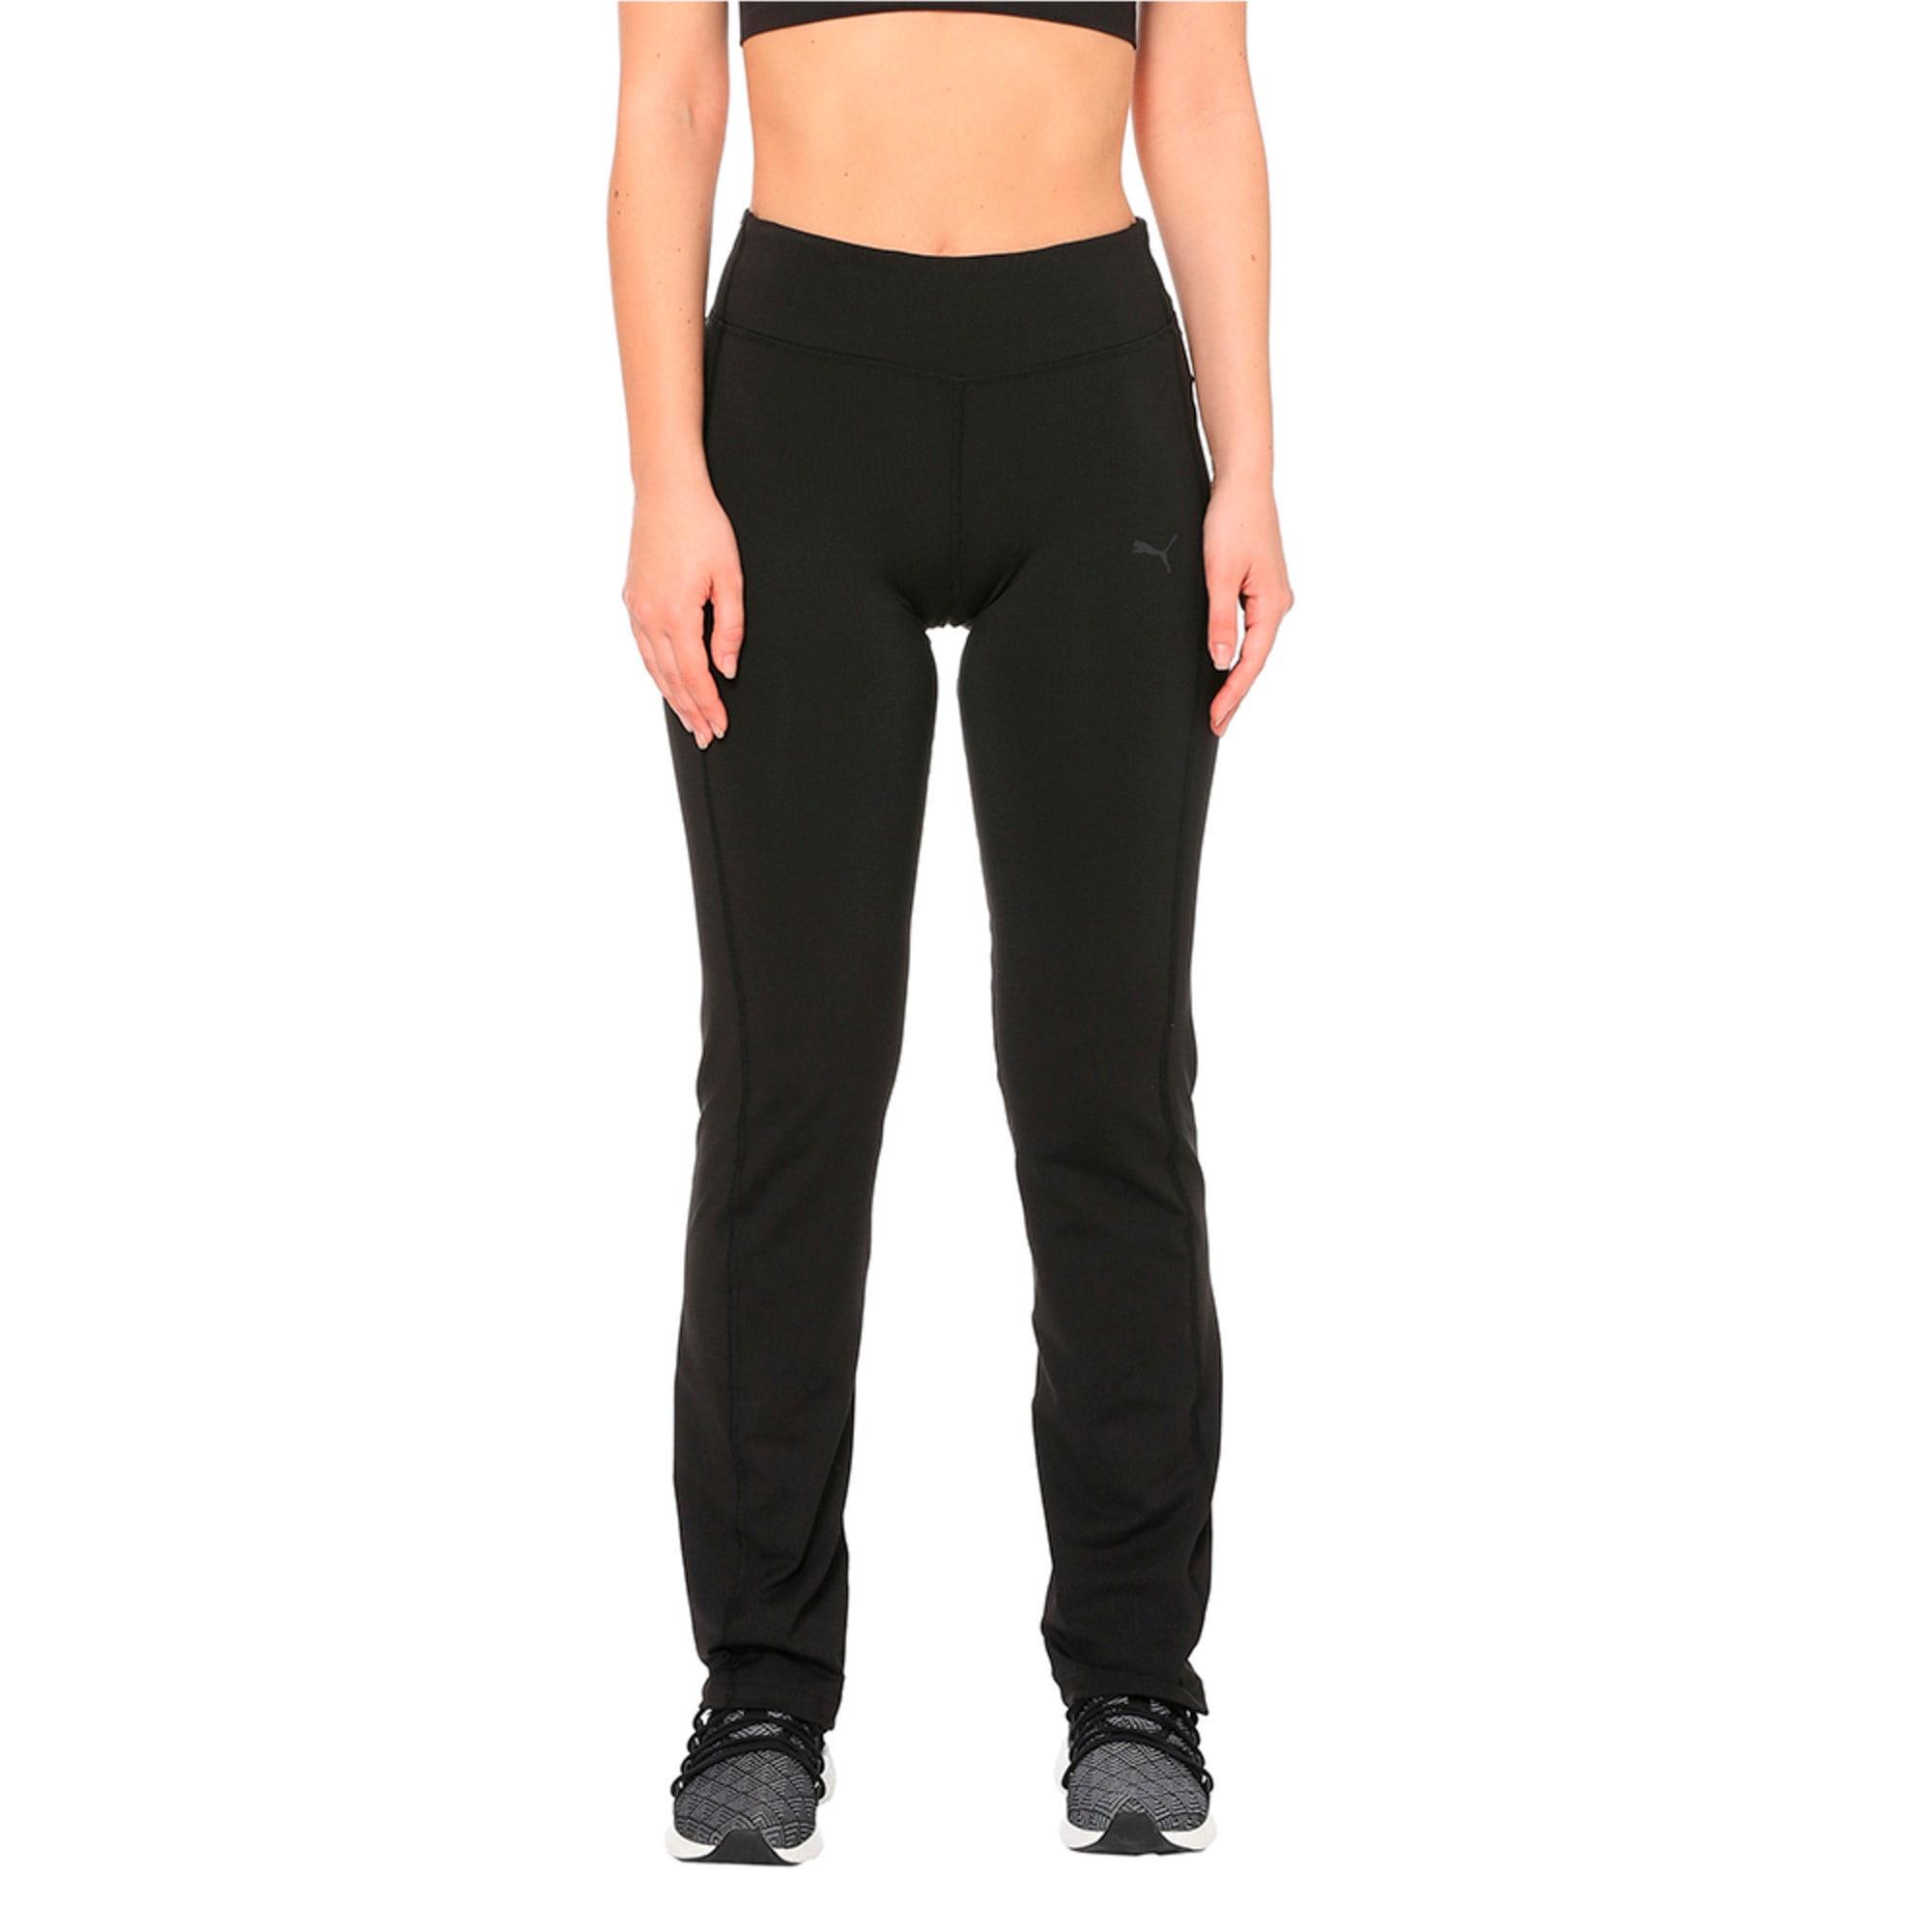 Thumbnail 3 of Training Pants, Puma Black, medium-IND